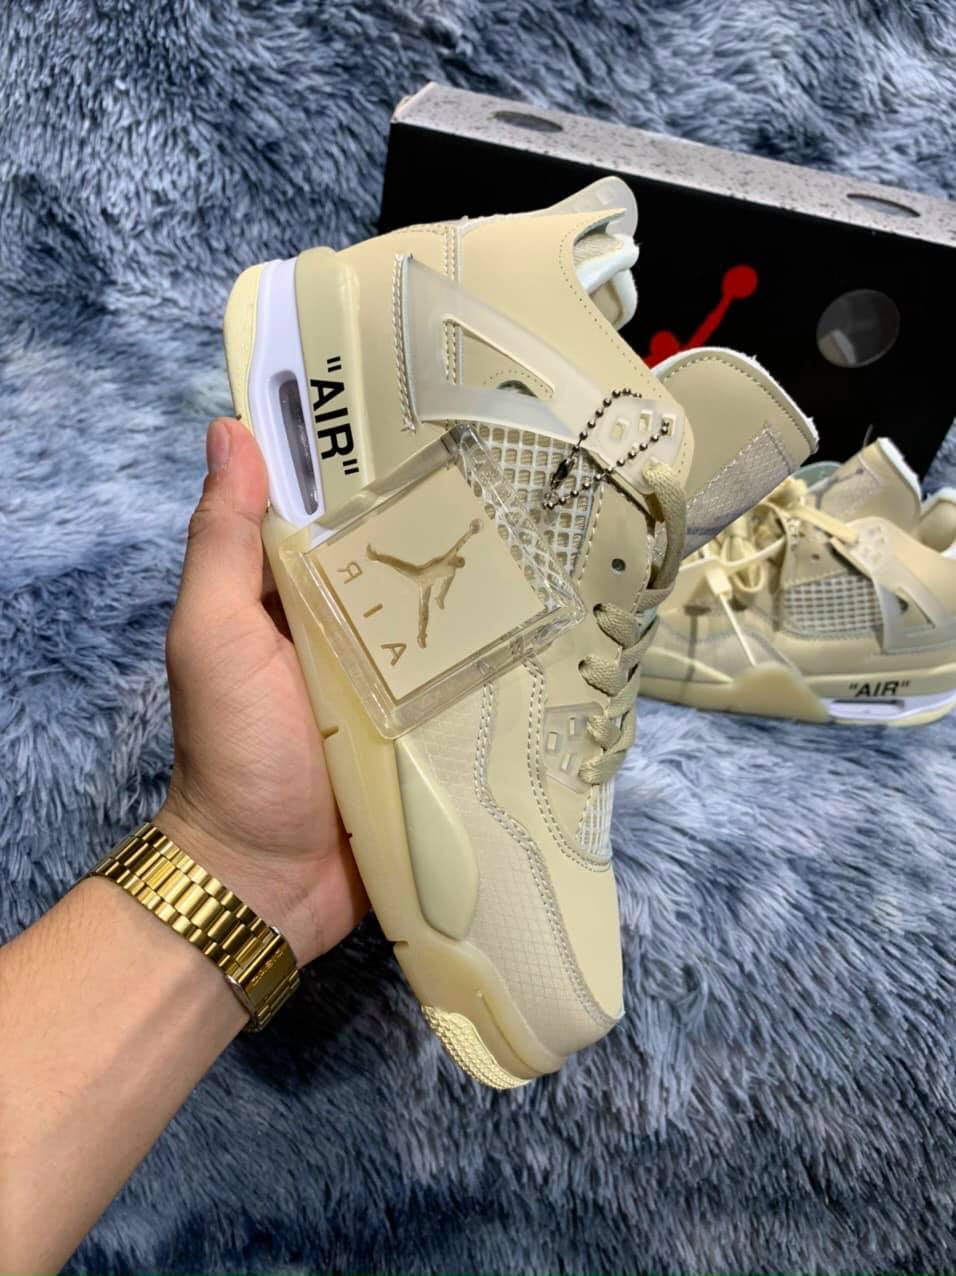 Trên tay giày Nike Air Jordan 4 Retro Off-White Sail